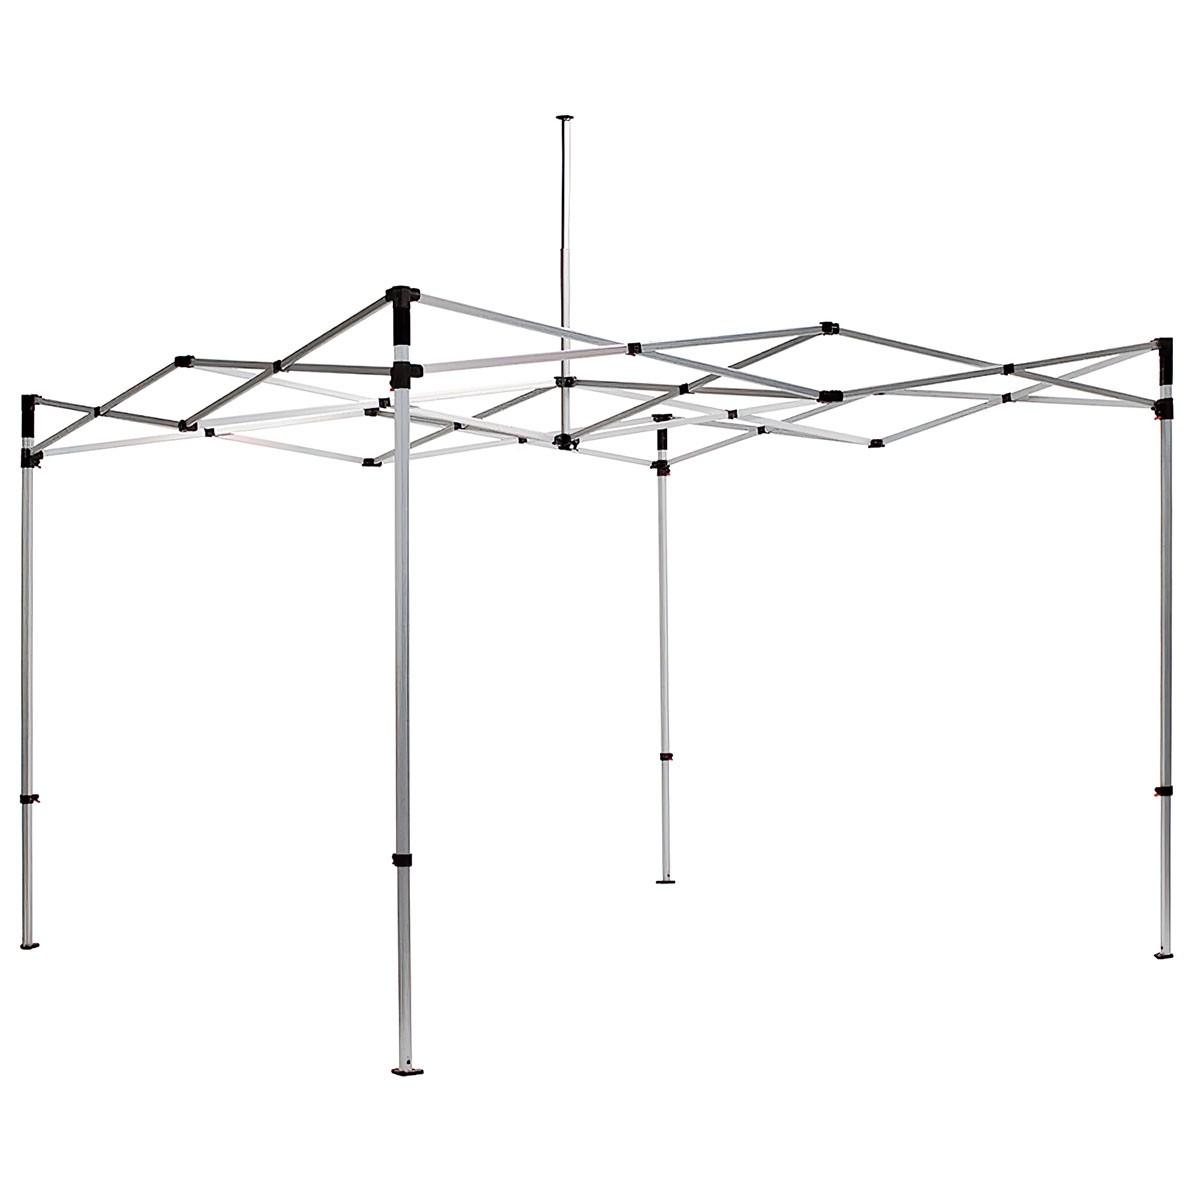 Economy Aluminum Frame Canopy Tent Kit